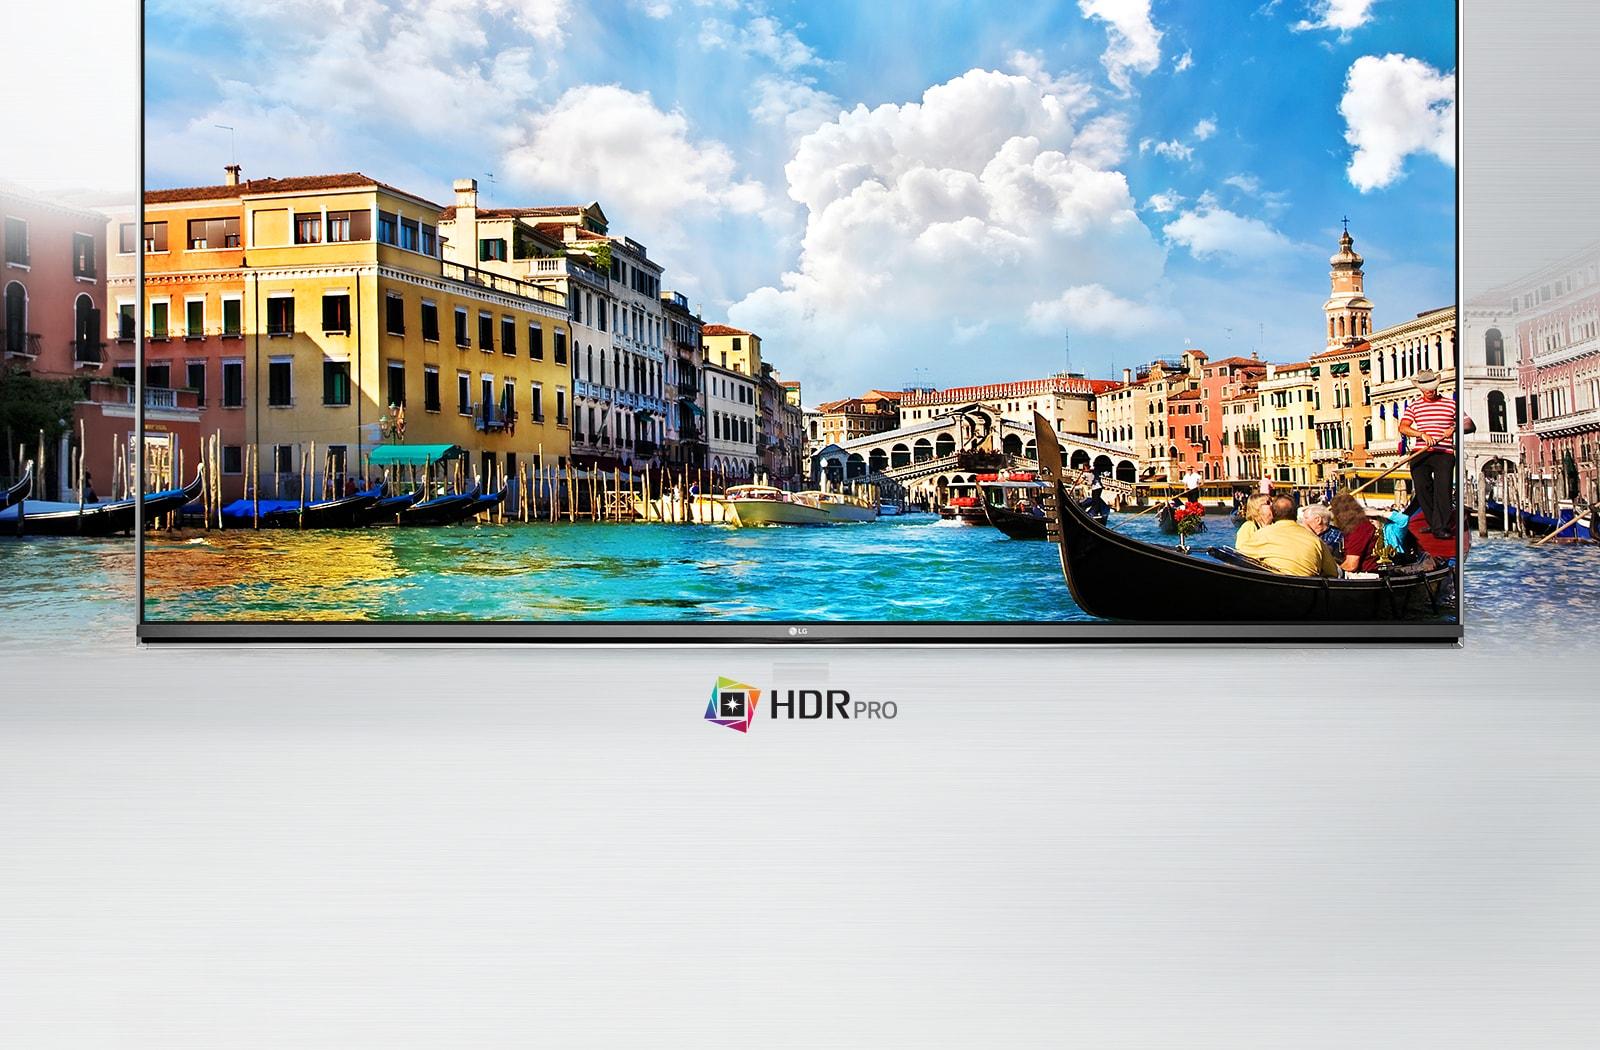 HDR PRO:แสดงประสิทธิภาพ HDR ได้ดีเยี่ยม ภาพสมจริง